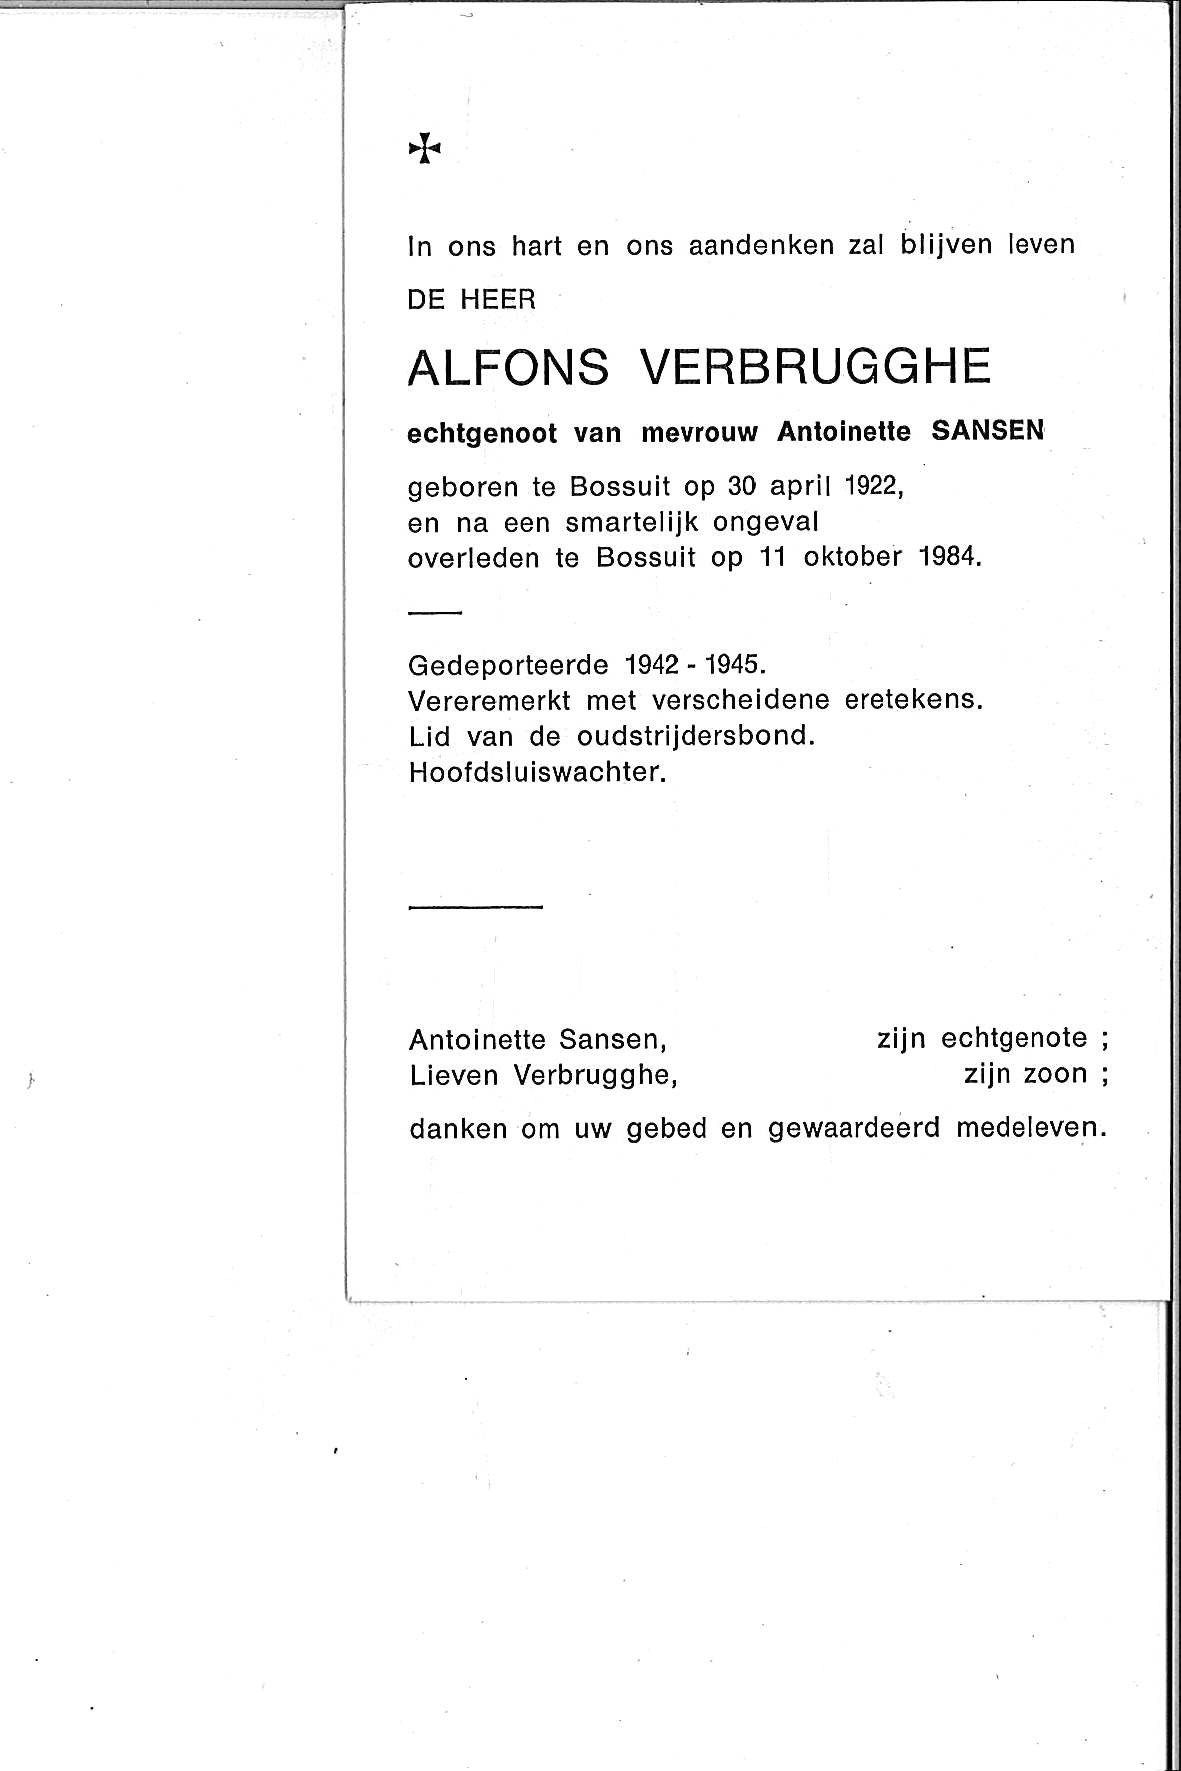 Verbrugghe Alfons